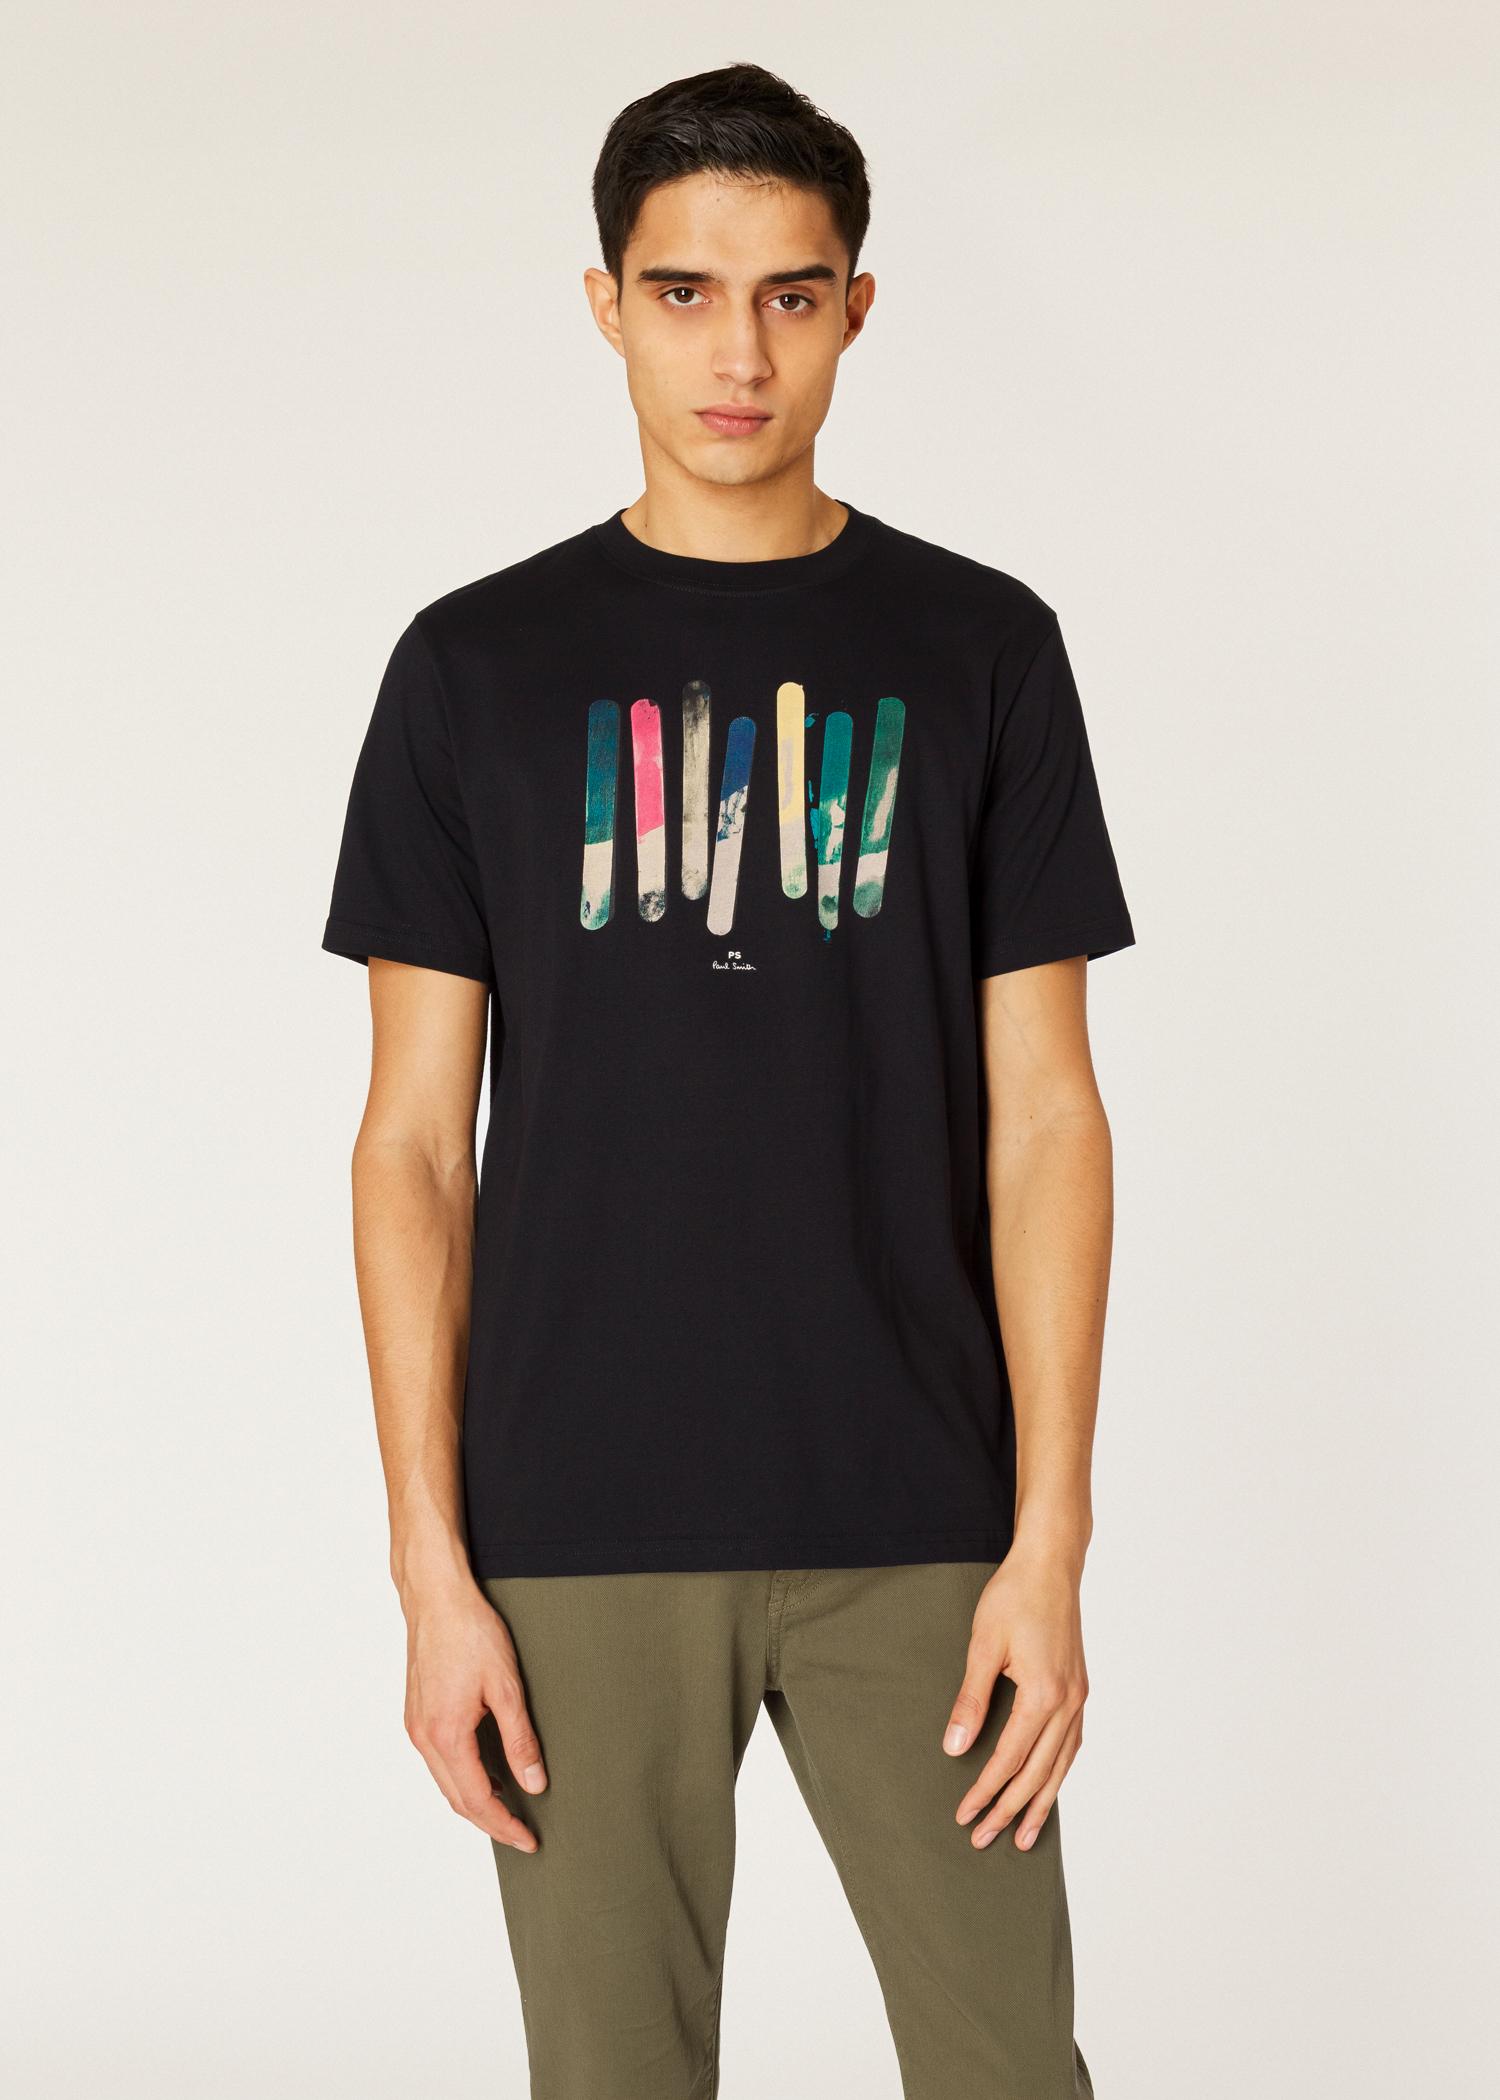 840be0fe1c5b Model front close up - Men's Black 'Paint Sticks' Print Organic-Cotton T